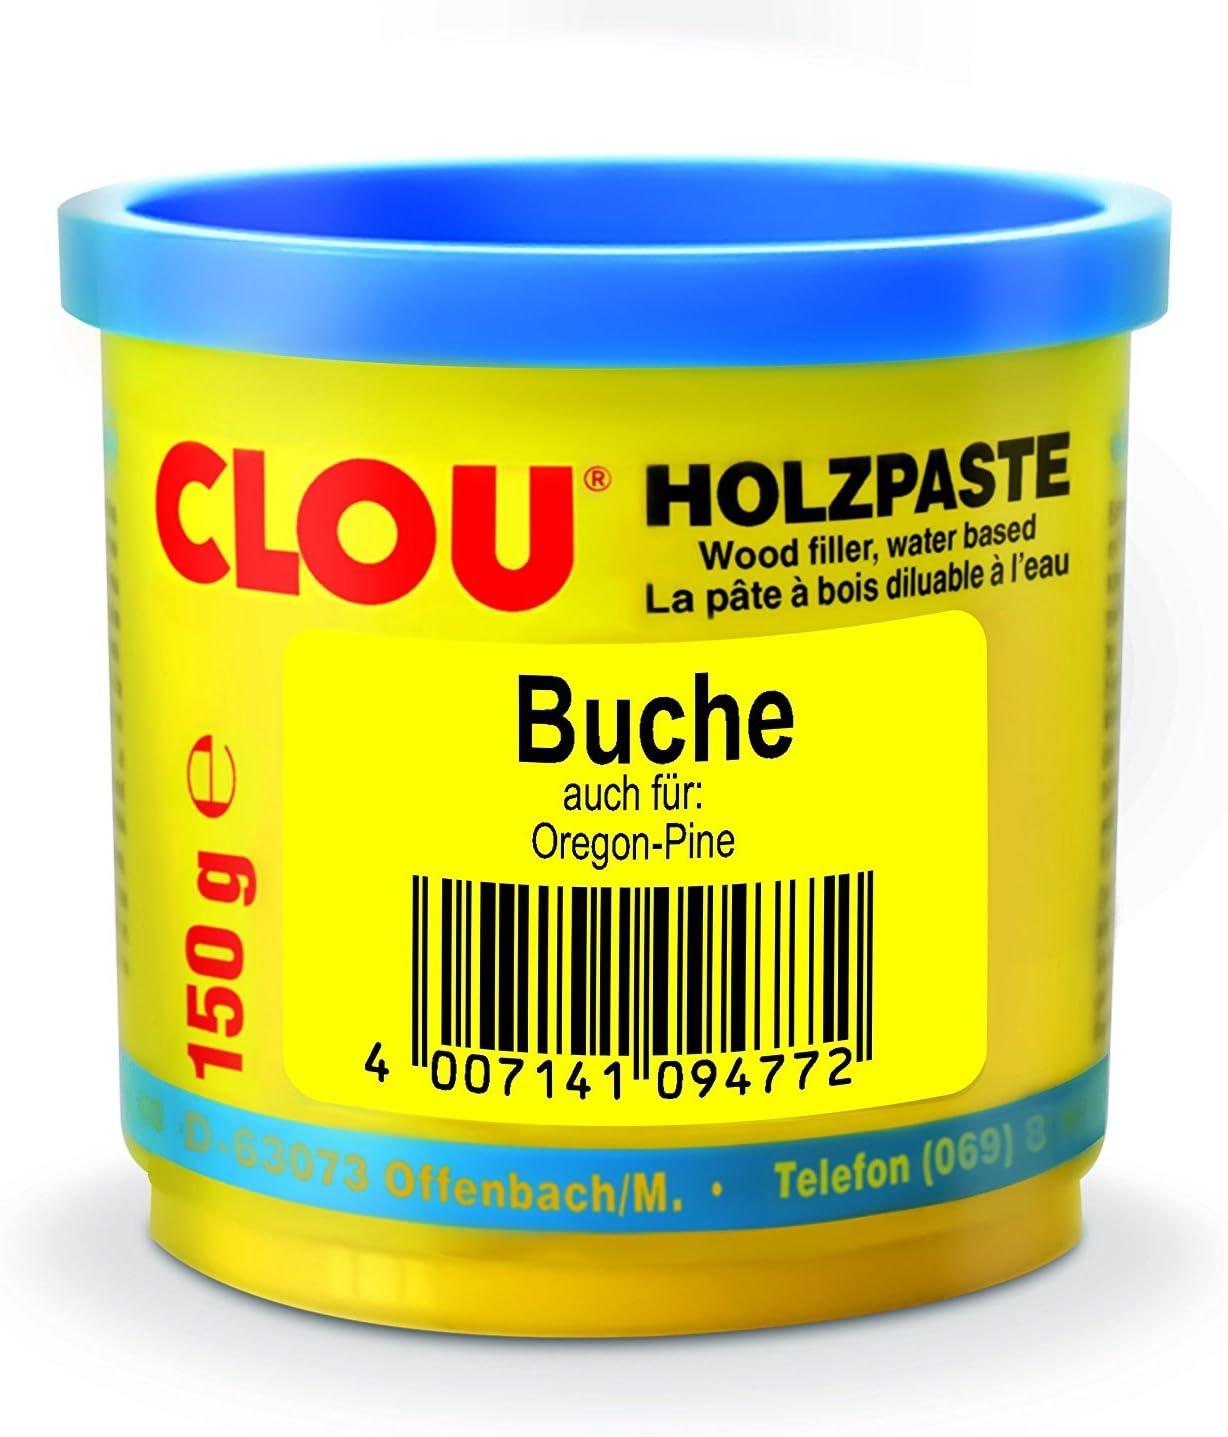 150 g Clou Holzpaste wv 4 buche